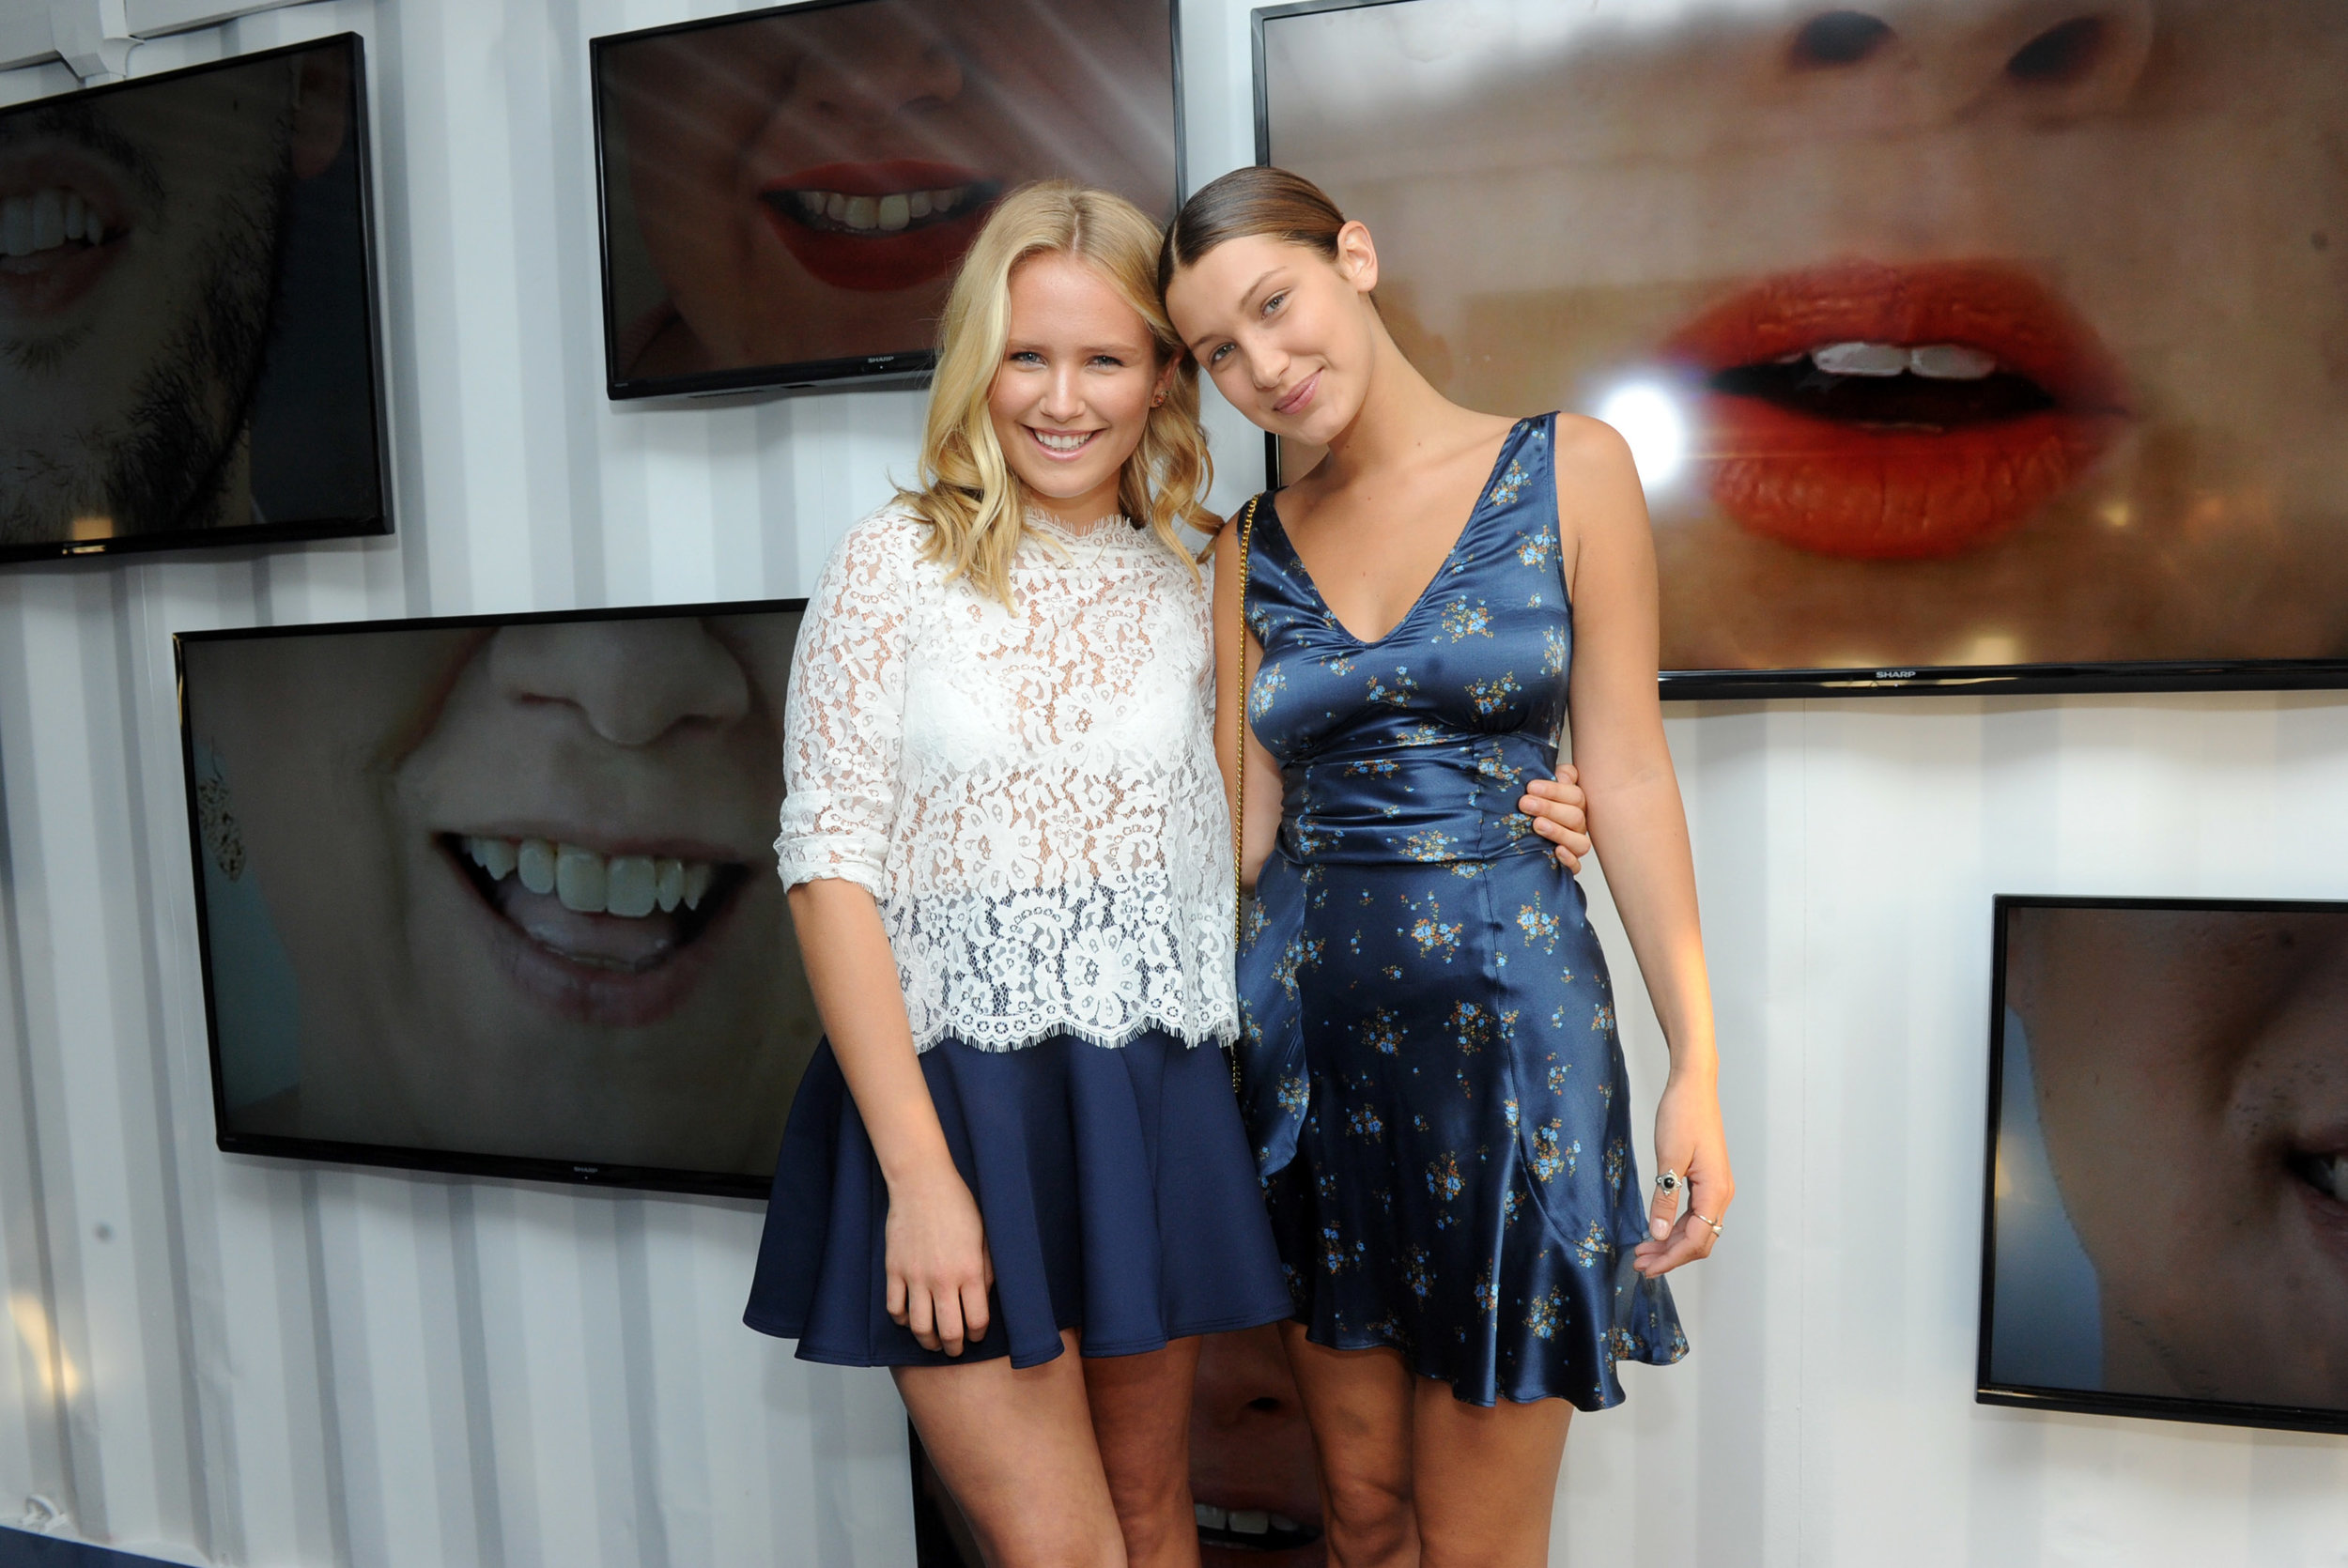 Sailor Brinkley Cook & Bella Hadid at Smile Train event in NYC